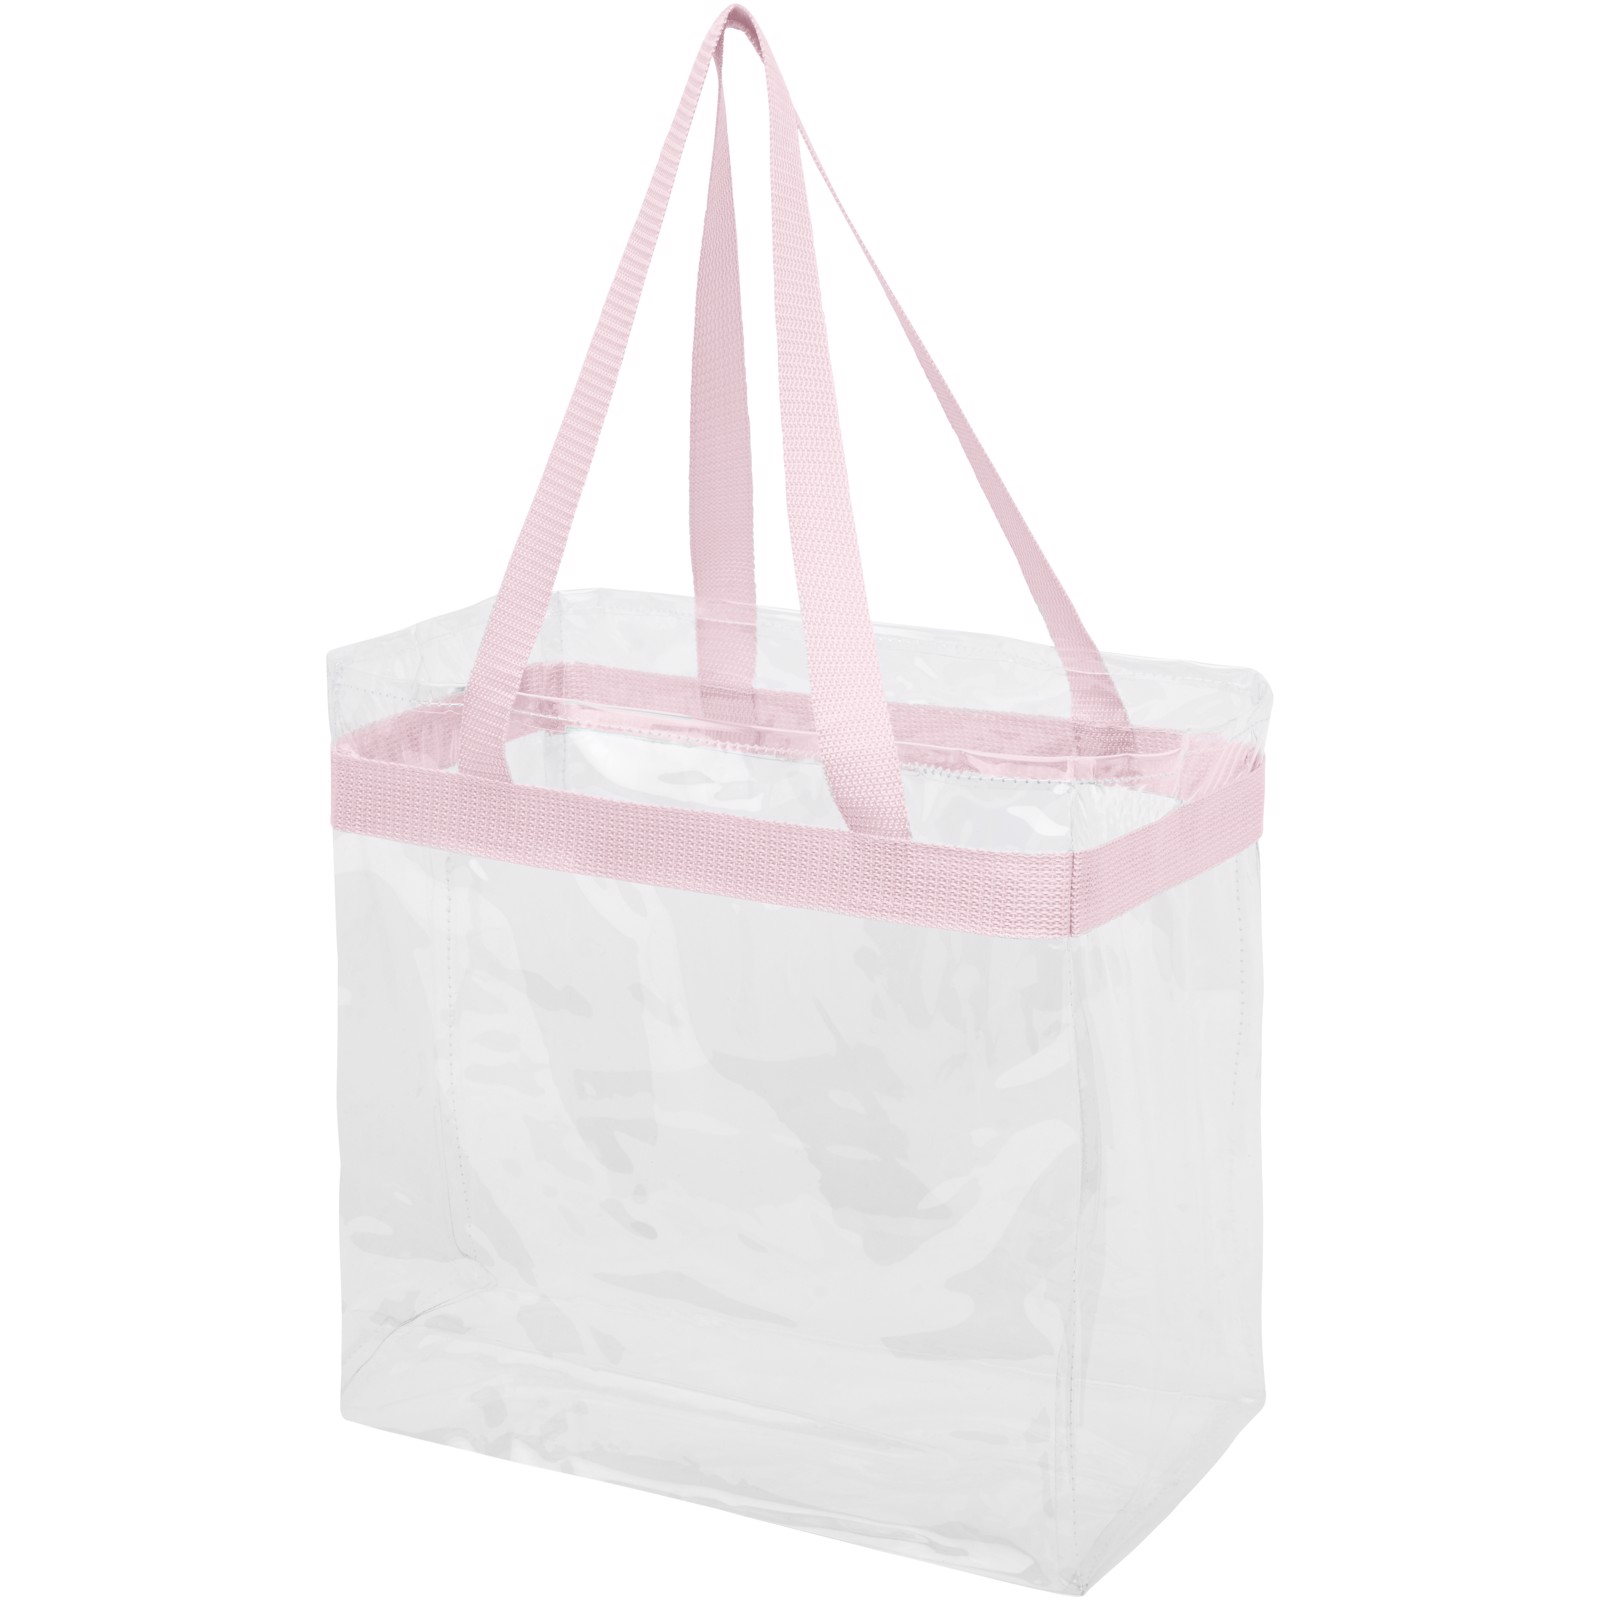 Hampton transparent tote bag - Light pink / Transparent clear